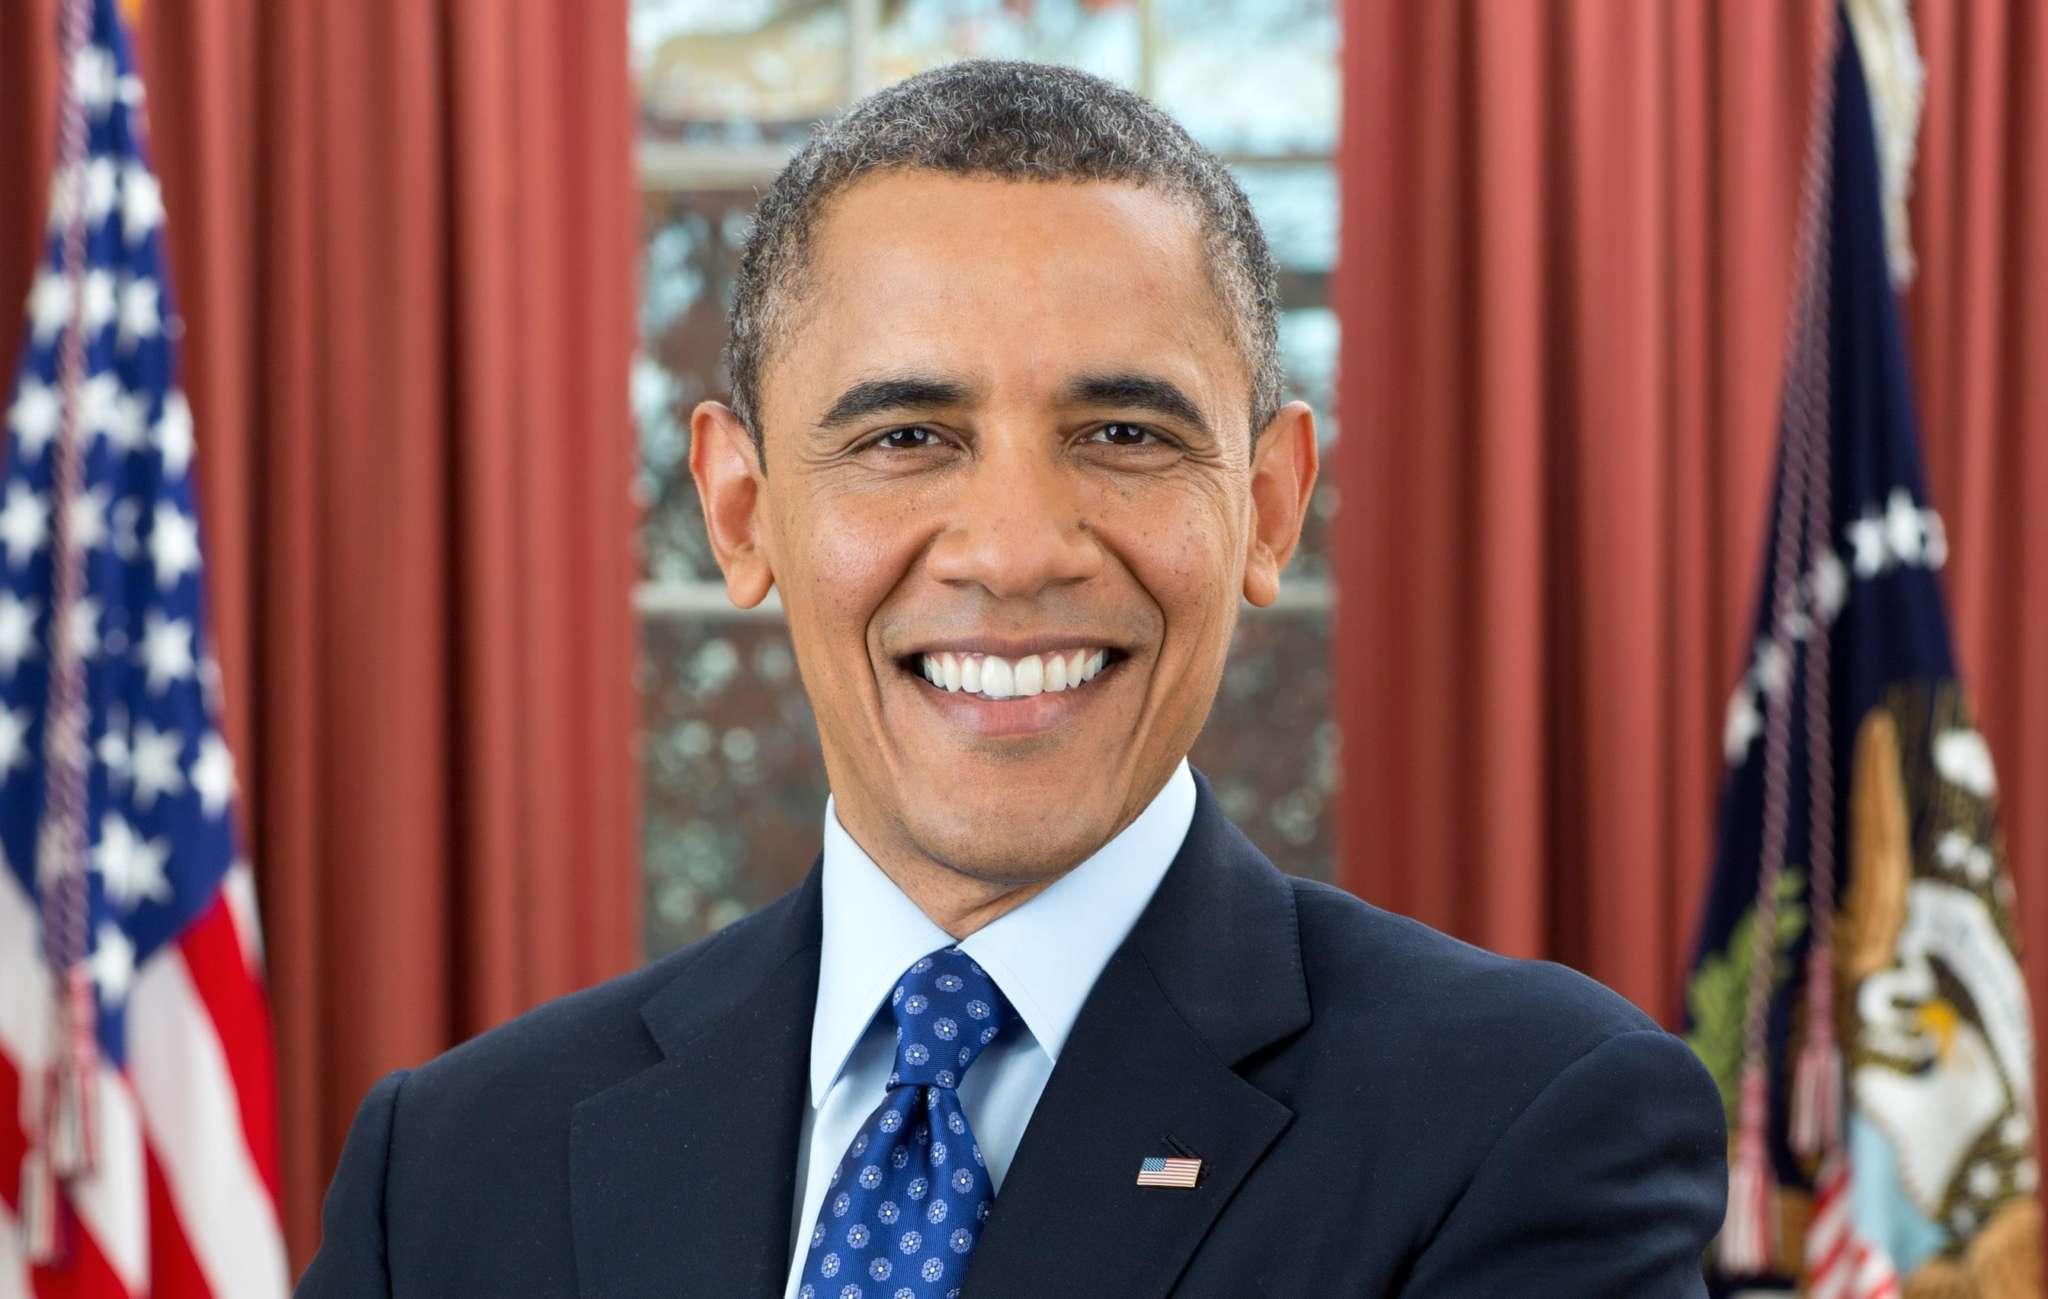 Tamar Braxton Misses President Barack Obama - Here's Her Message